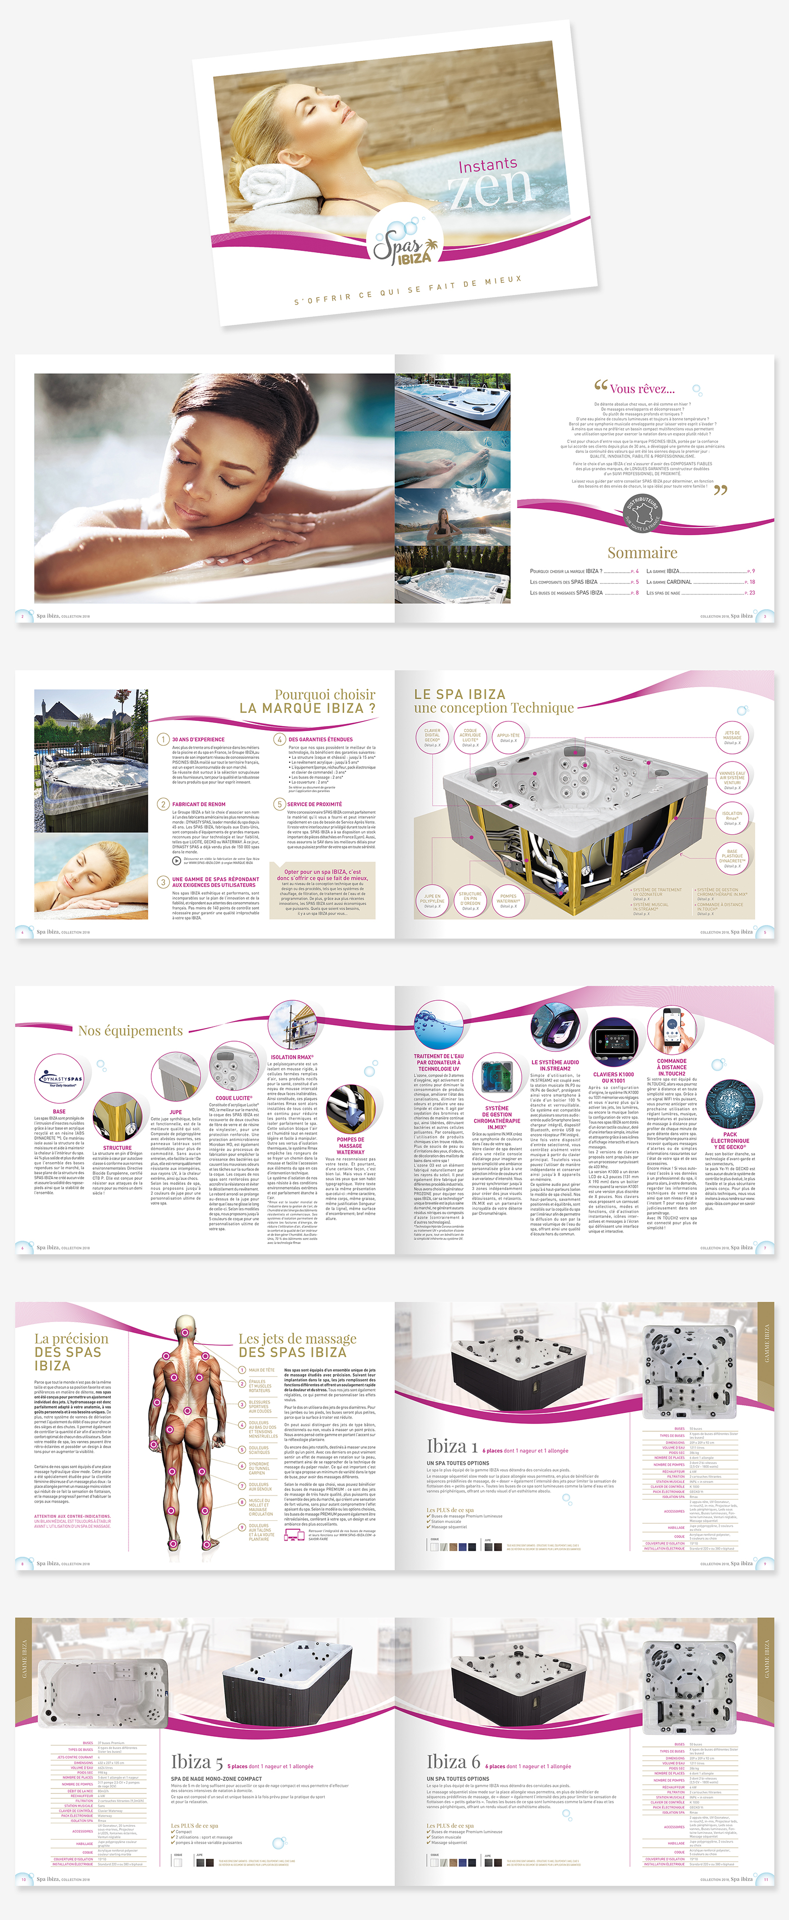 image-ibiza-brochure-saps.jpg